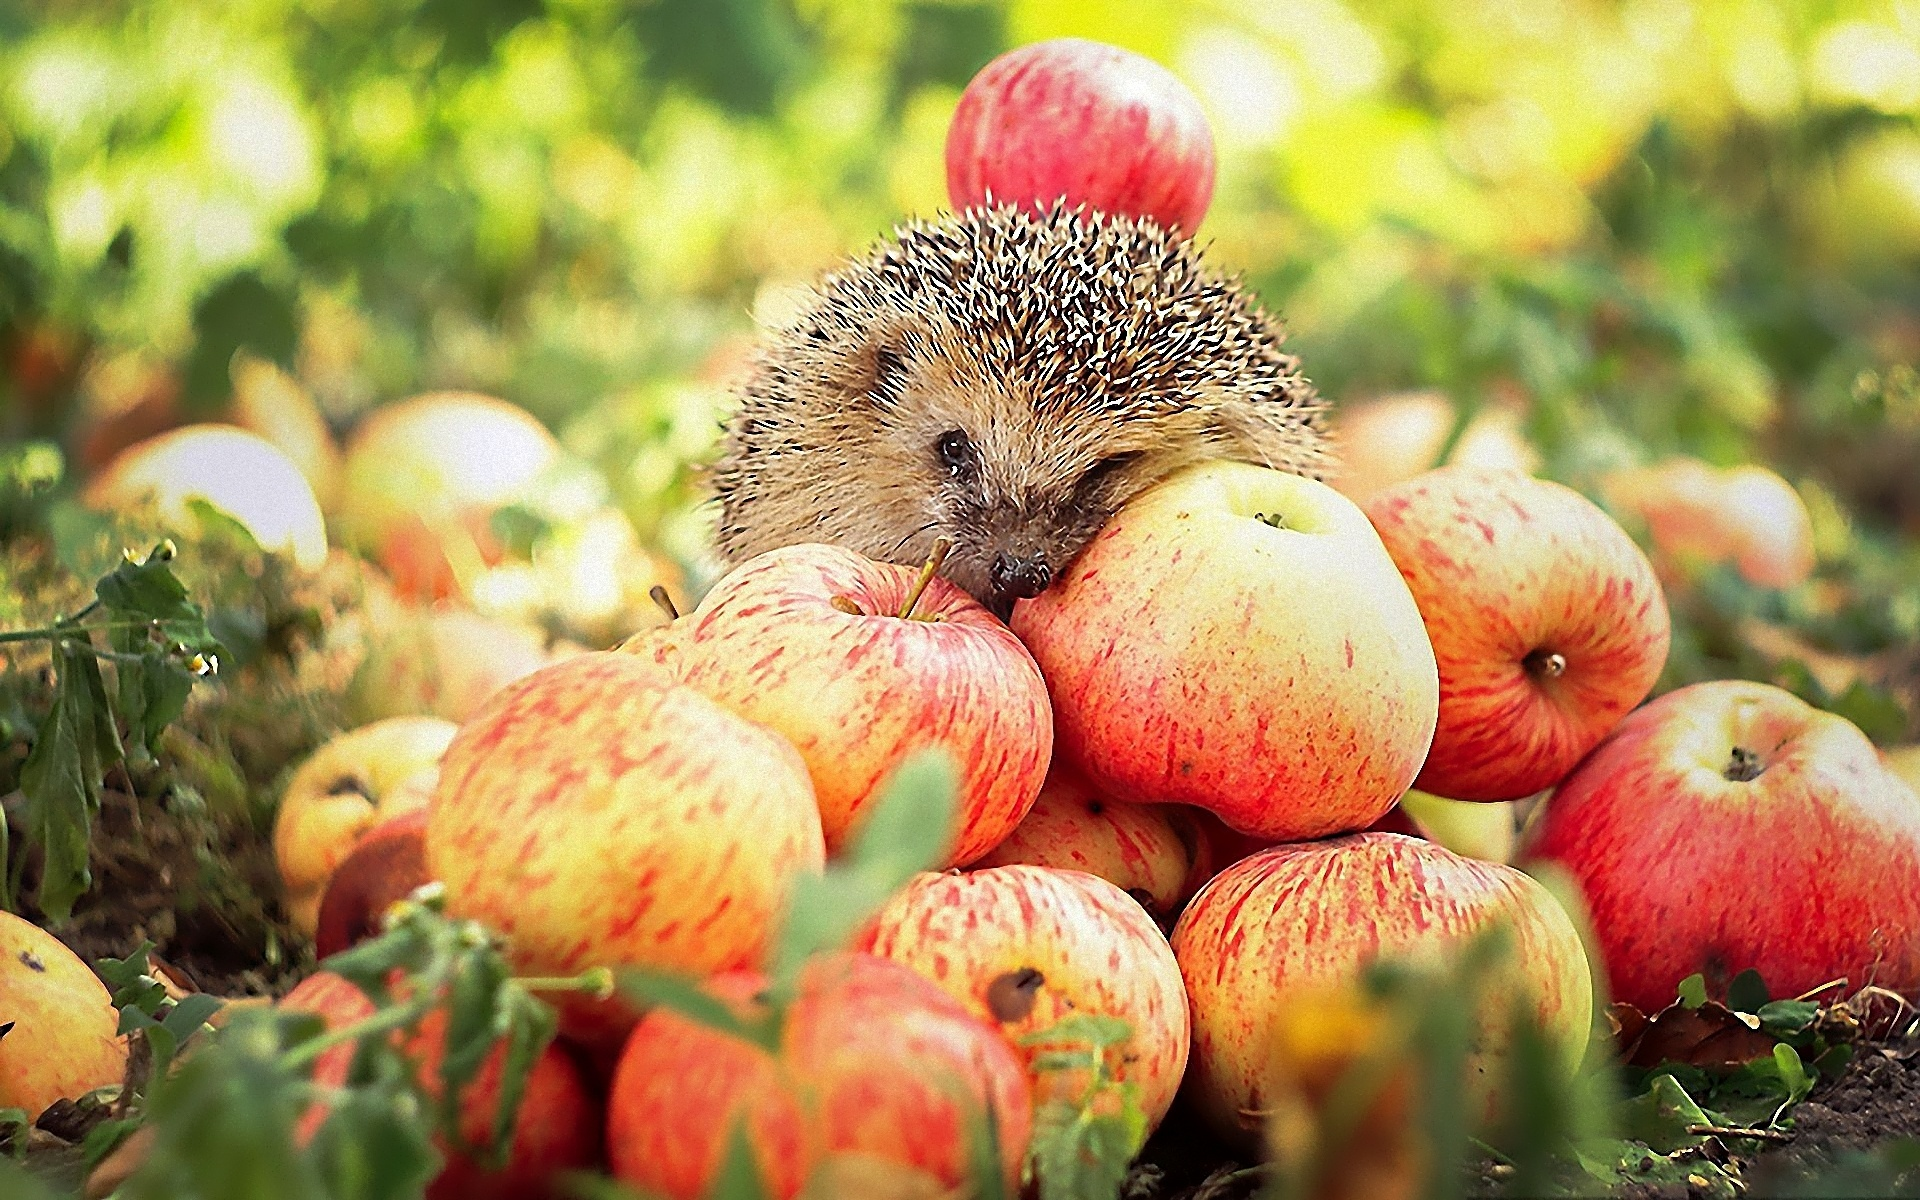 яблоки  № 164278 бесплатно